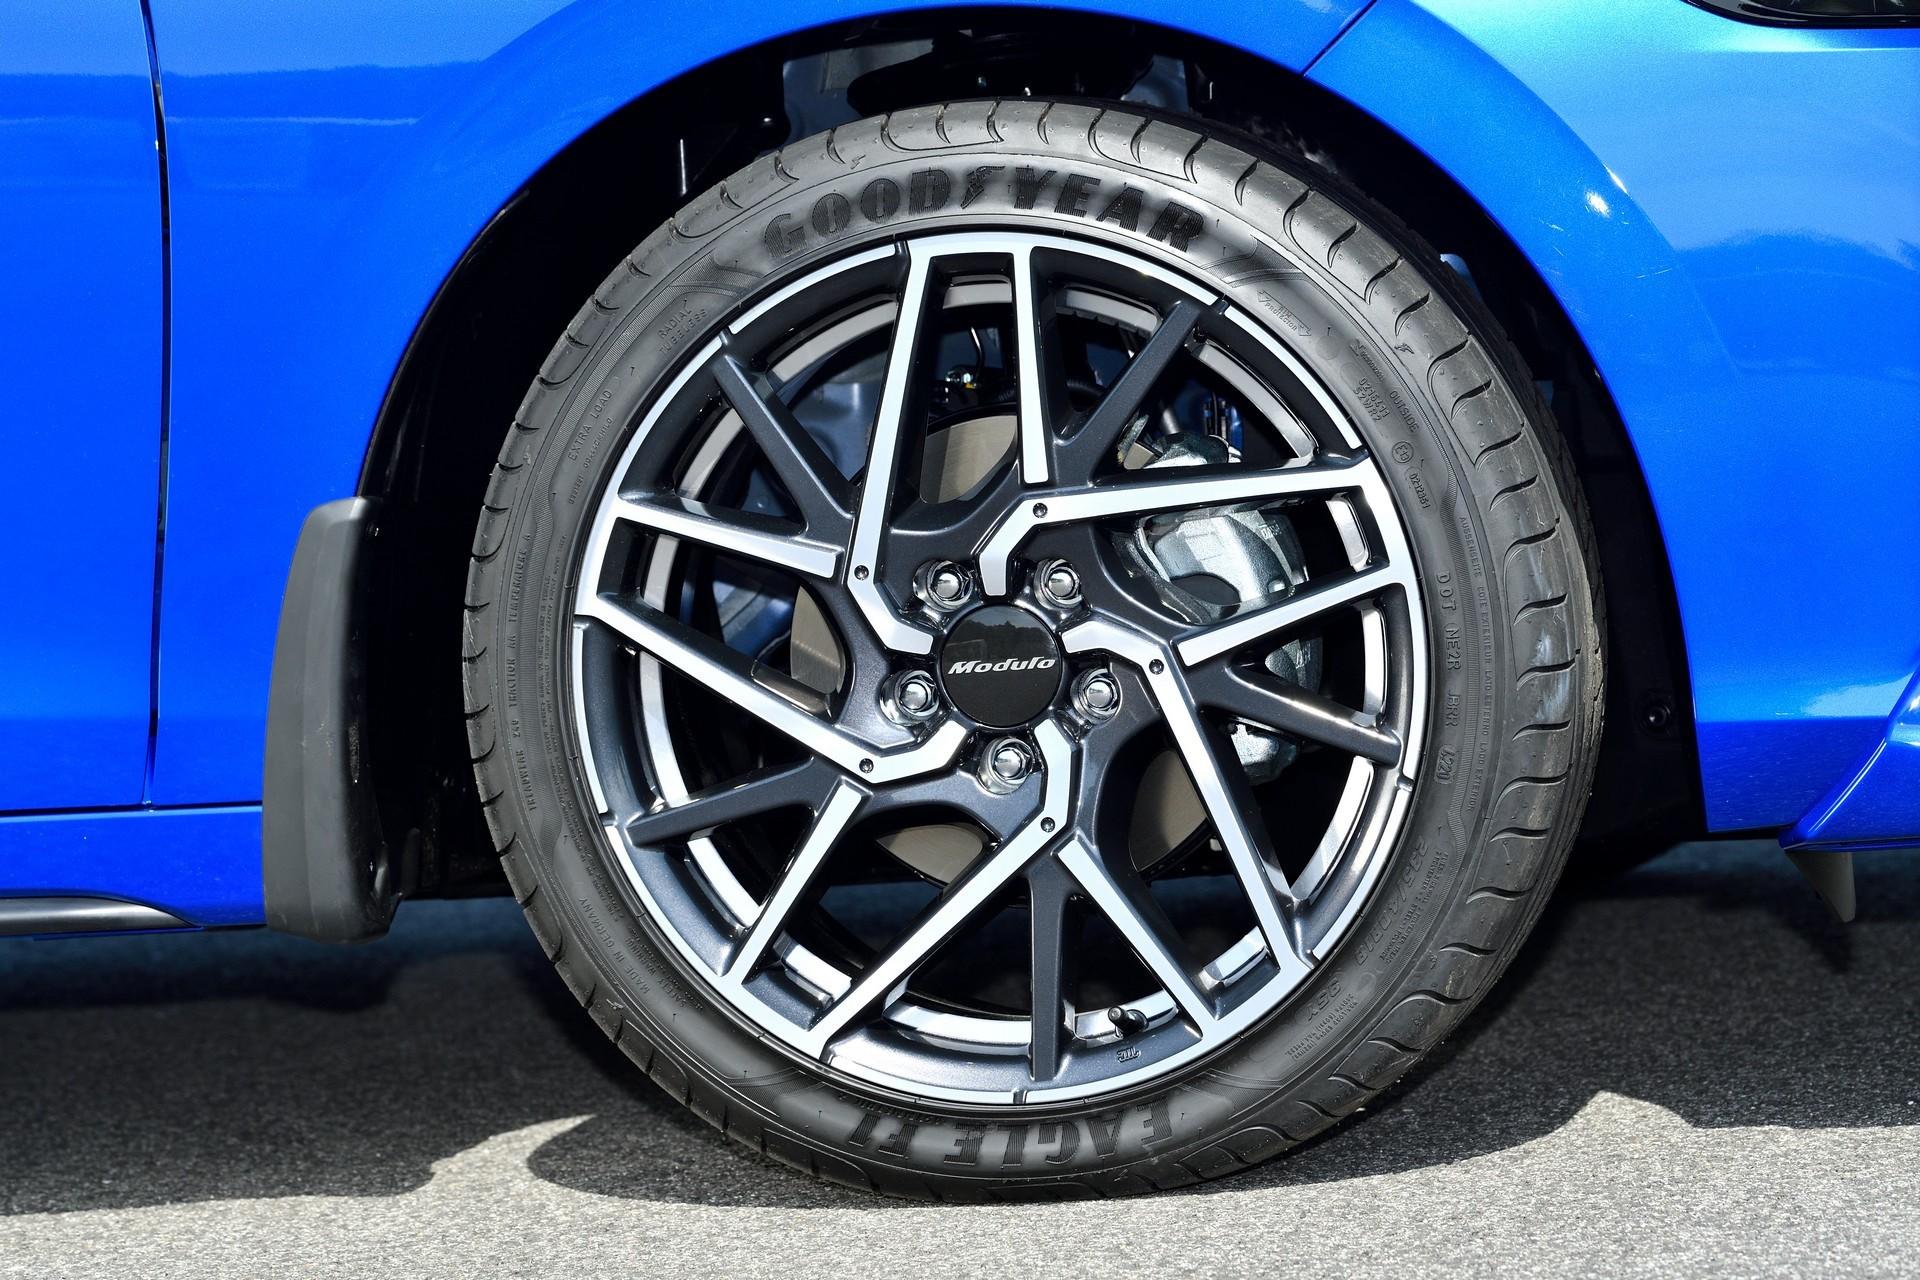 2022-Honda-Civic-Hatch-Accessories-9